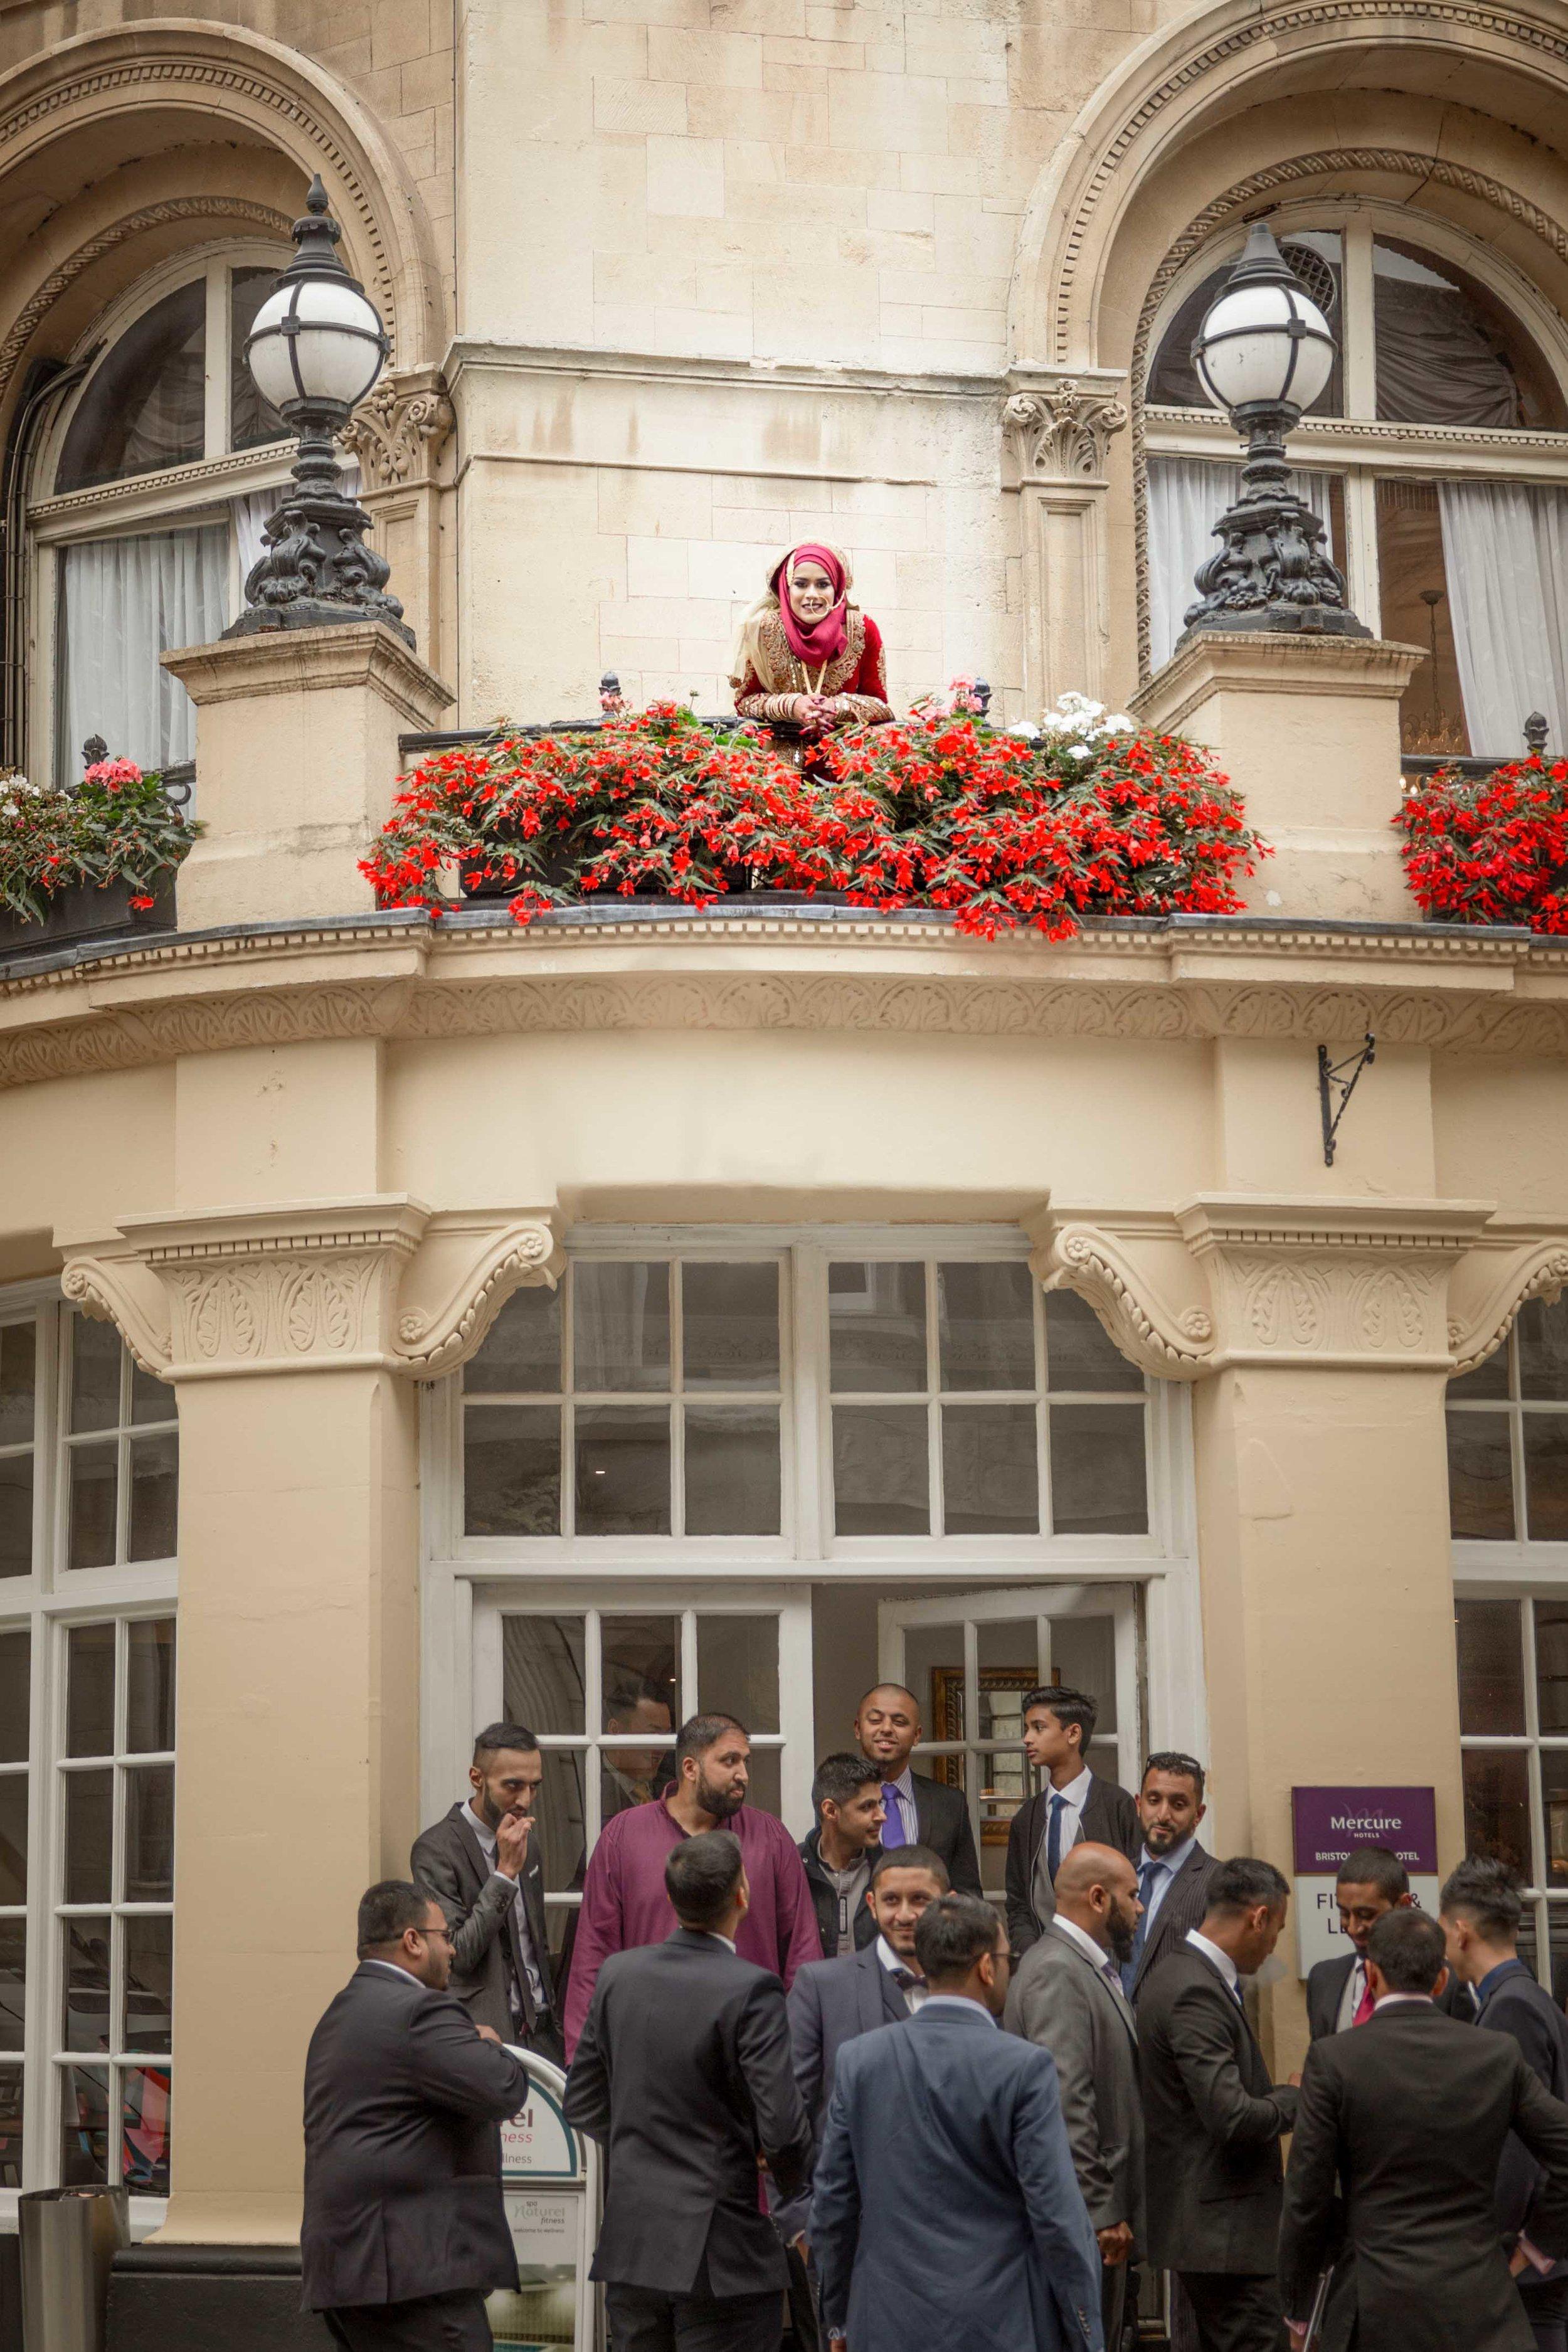 Female-wedding-photographer-bristol-mercure-bristol-grand-hotel-natalia-smith-photography-11.jpg